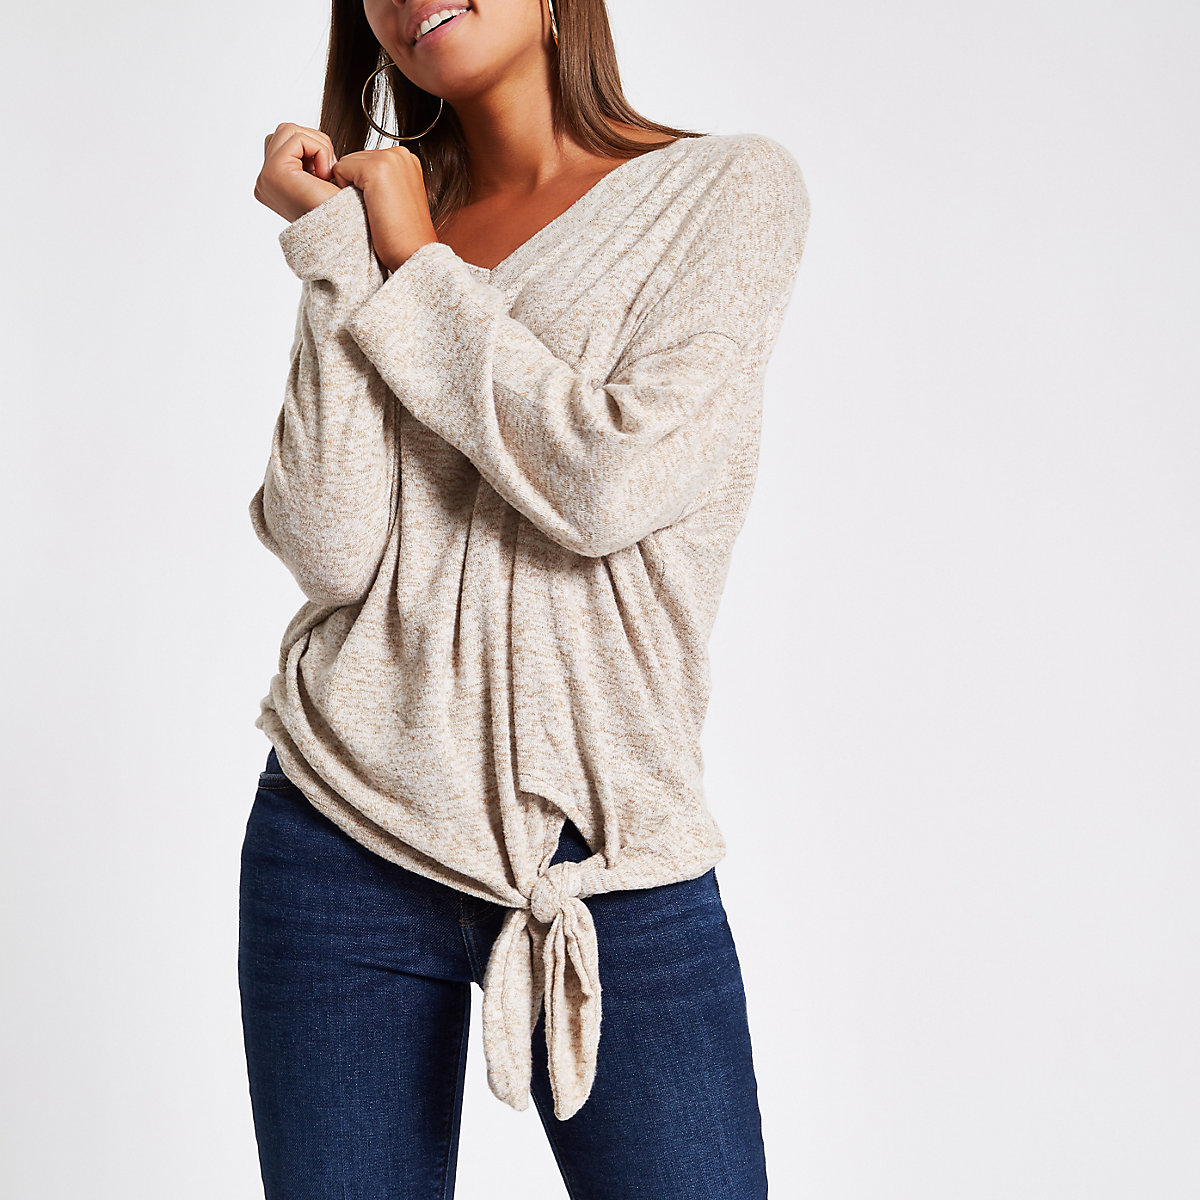 Beige hacci knit tie front top